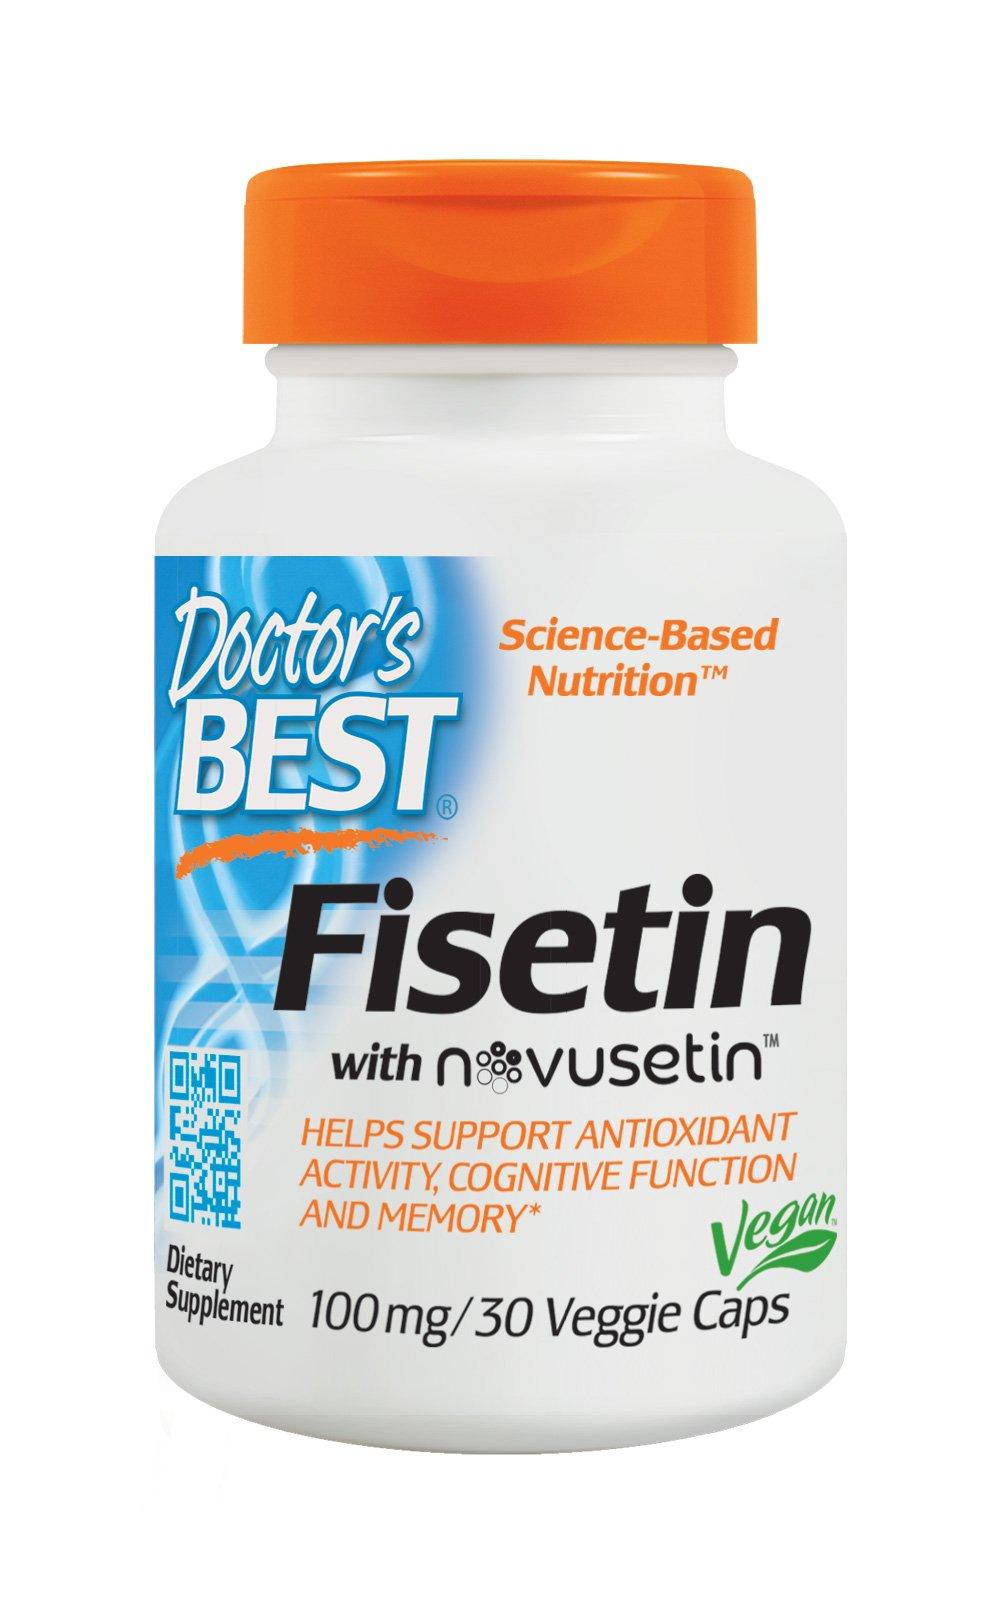 Doctor's Best Fisetin with Novusetin, Non-GMO, Vegan, Gluten Free, Soy Free, 100 mg, 30 Veggie Caps